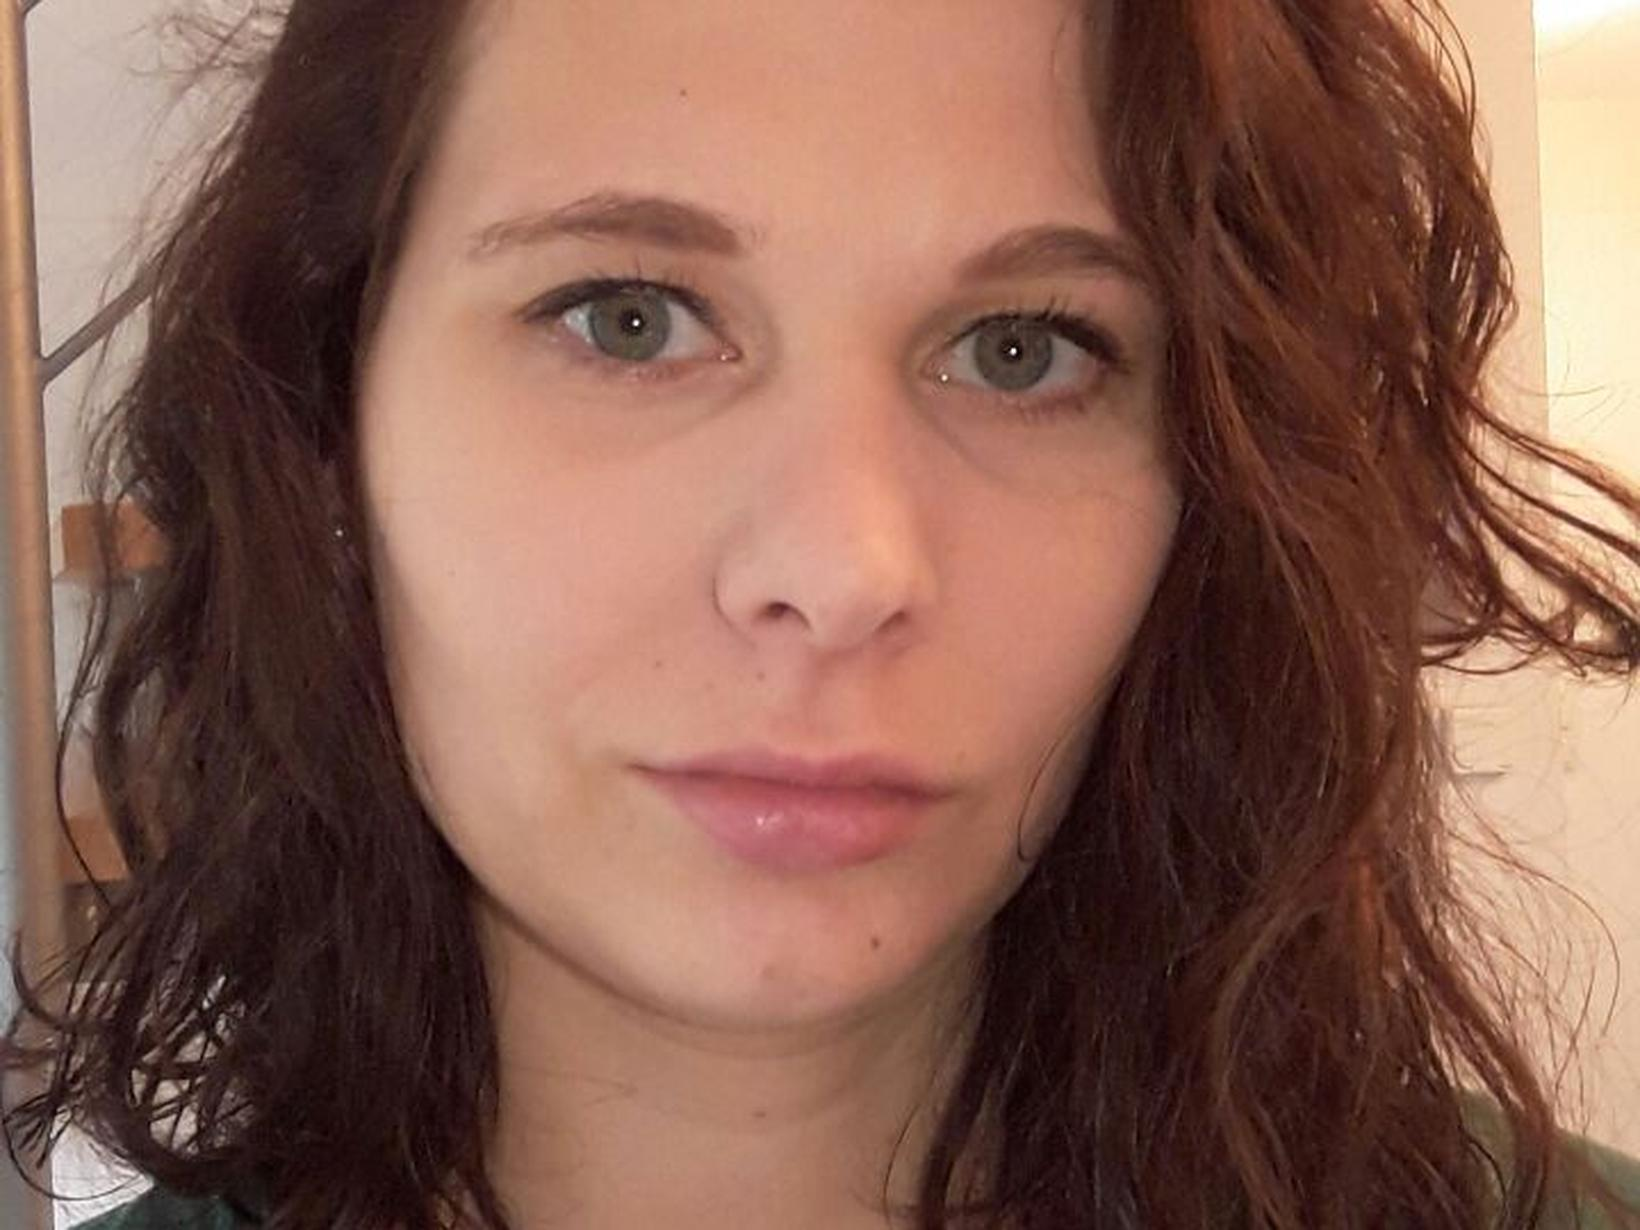 Mareike from Toronto, Ontario, Canada